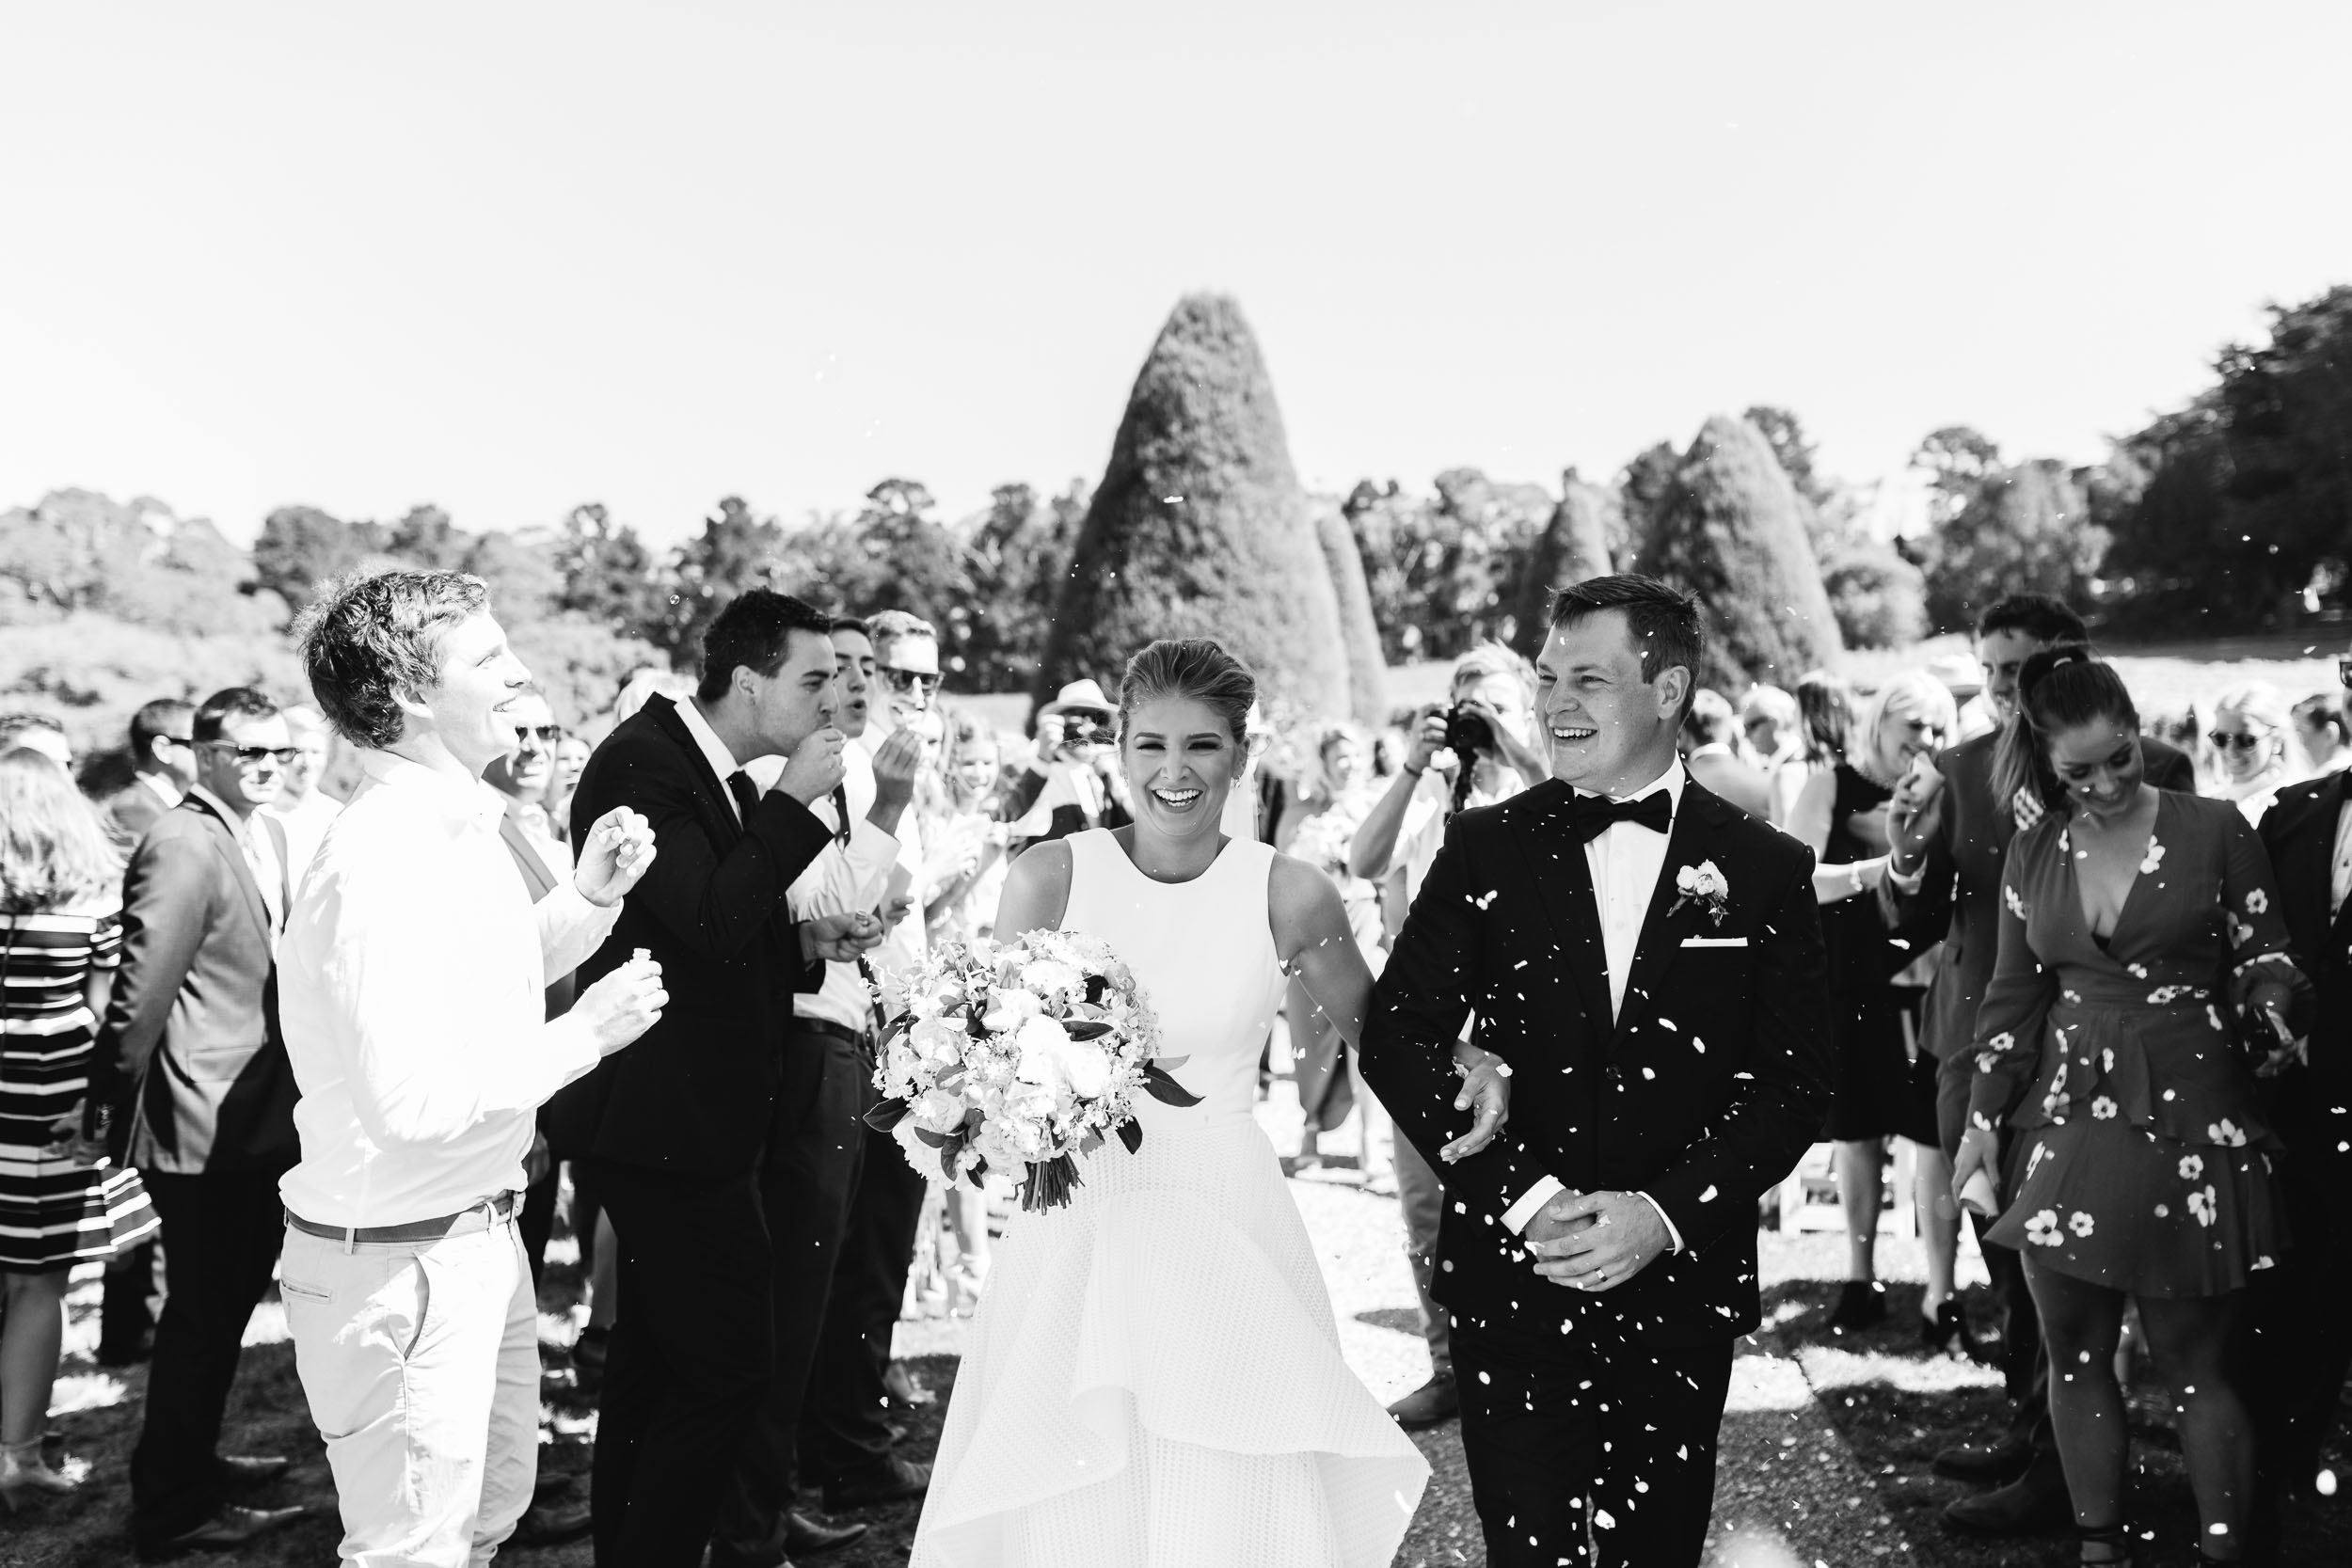 Kas-Richards-Mornington-Peninsula-Wedding-Lindenderry-Red-Hill-324.jpg